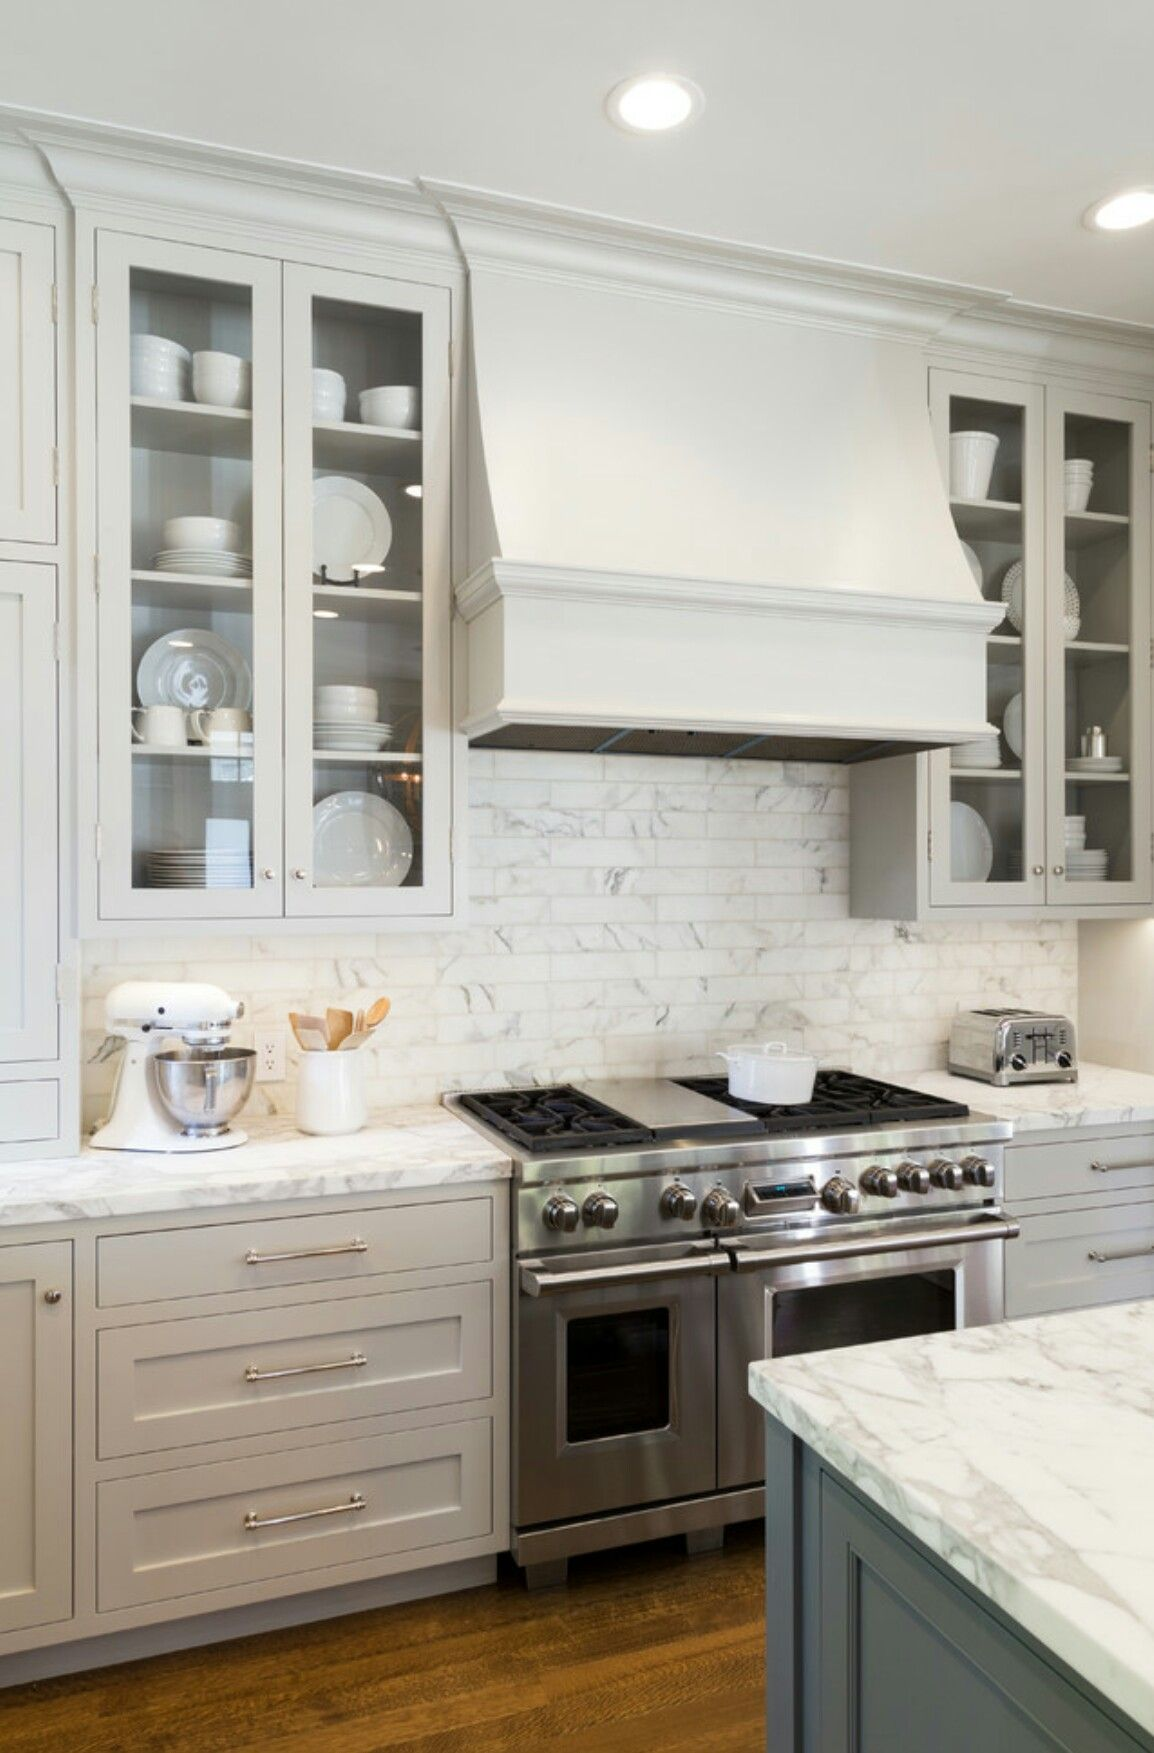 Bm Gray Owl Whale Grey And Calcutta Classic Grey Kitchen Designs Kitchen Design Kitchen Remodel